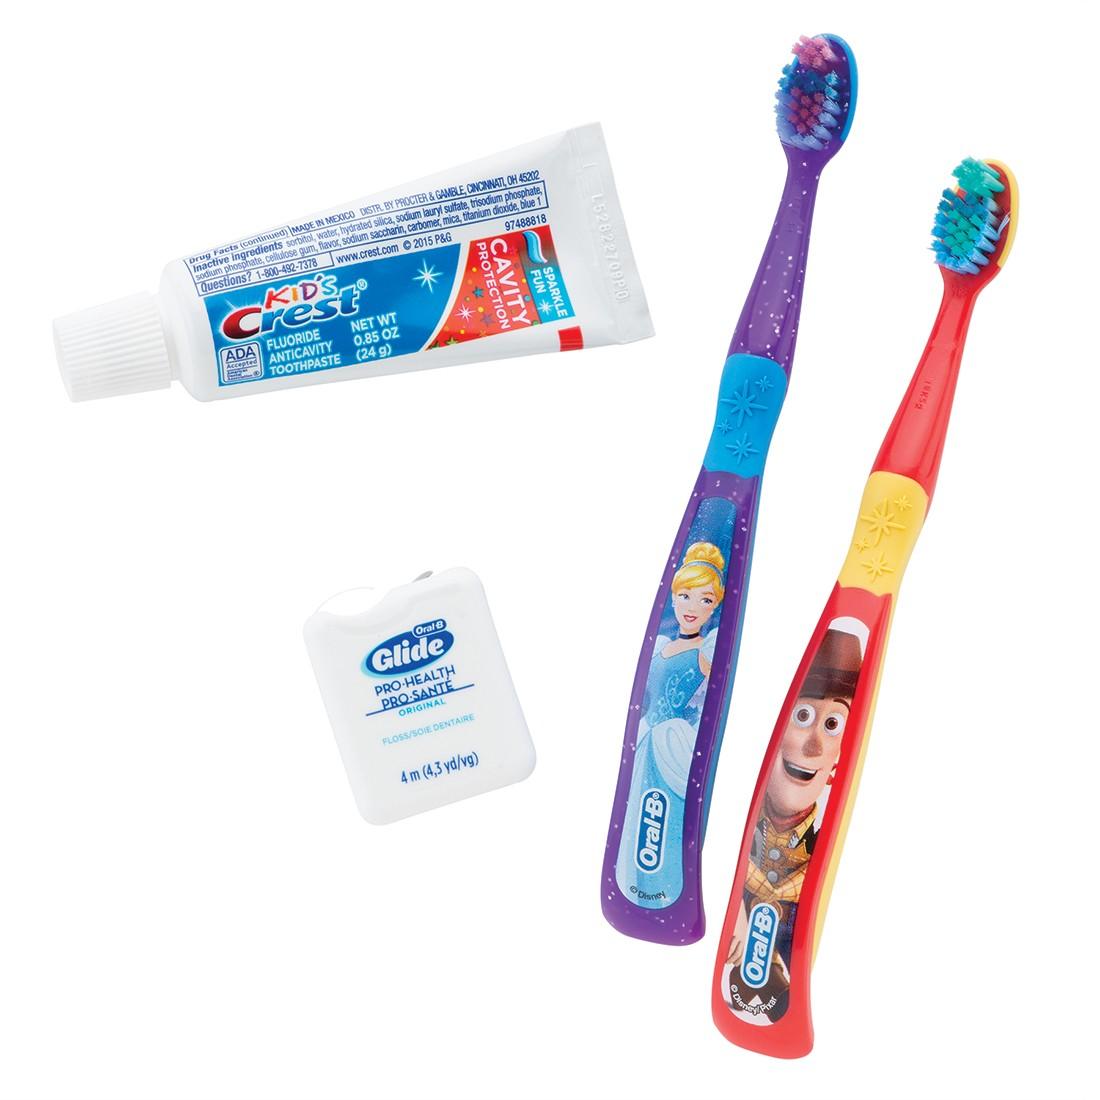 Oral-B® Youth Toy Story & Princess Bundle - Dental Kits from